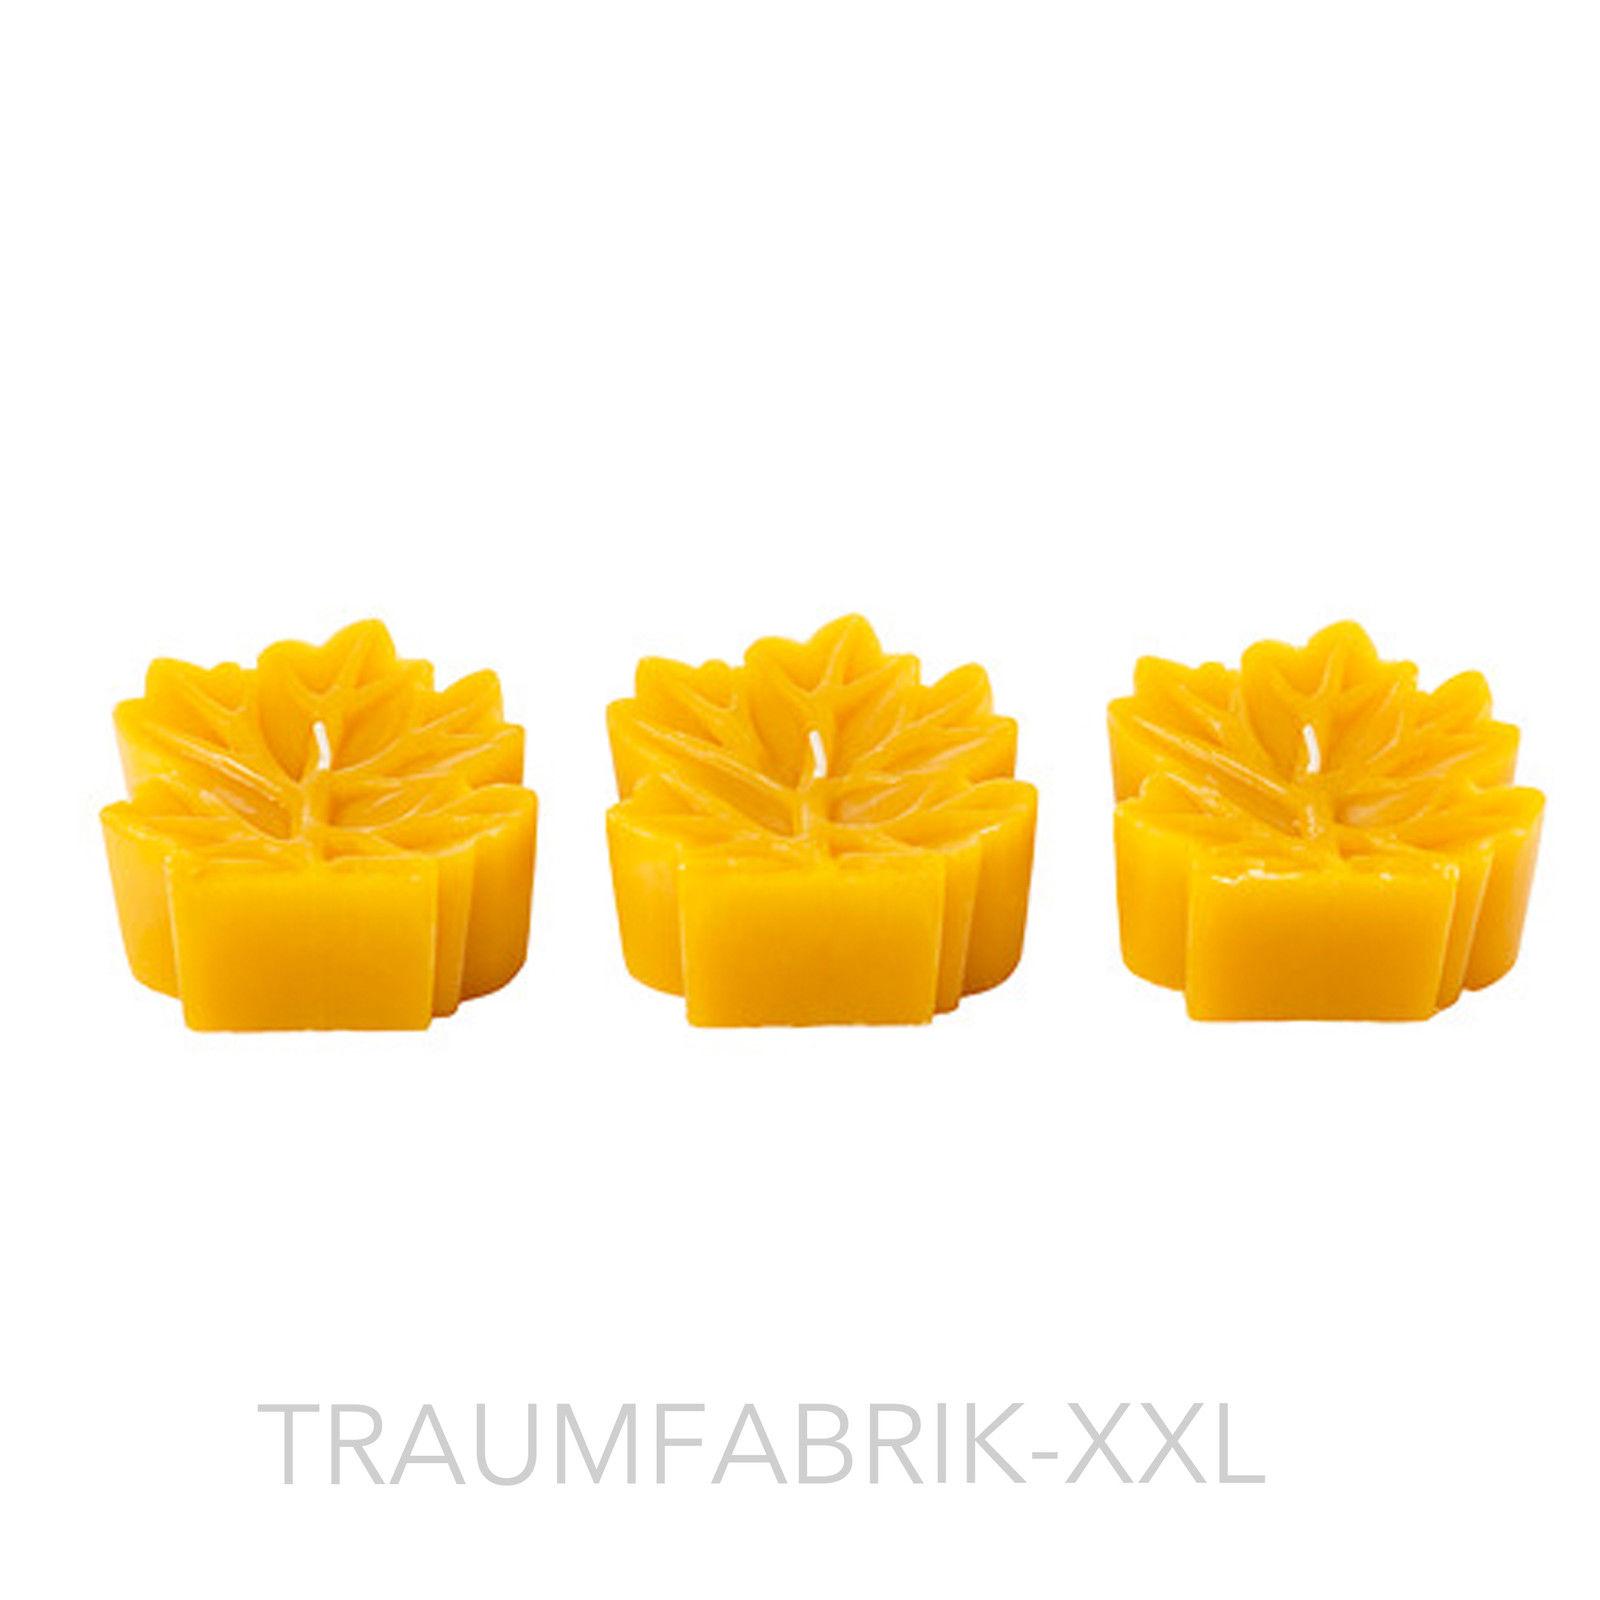 ikea ruggig 3er set kerzen kerze blockkerze blockkerzen dekokerze bl tter orange traumfabrik xxl. Black Bedroom Furniture Sets. Home Design Ideas